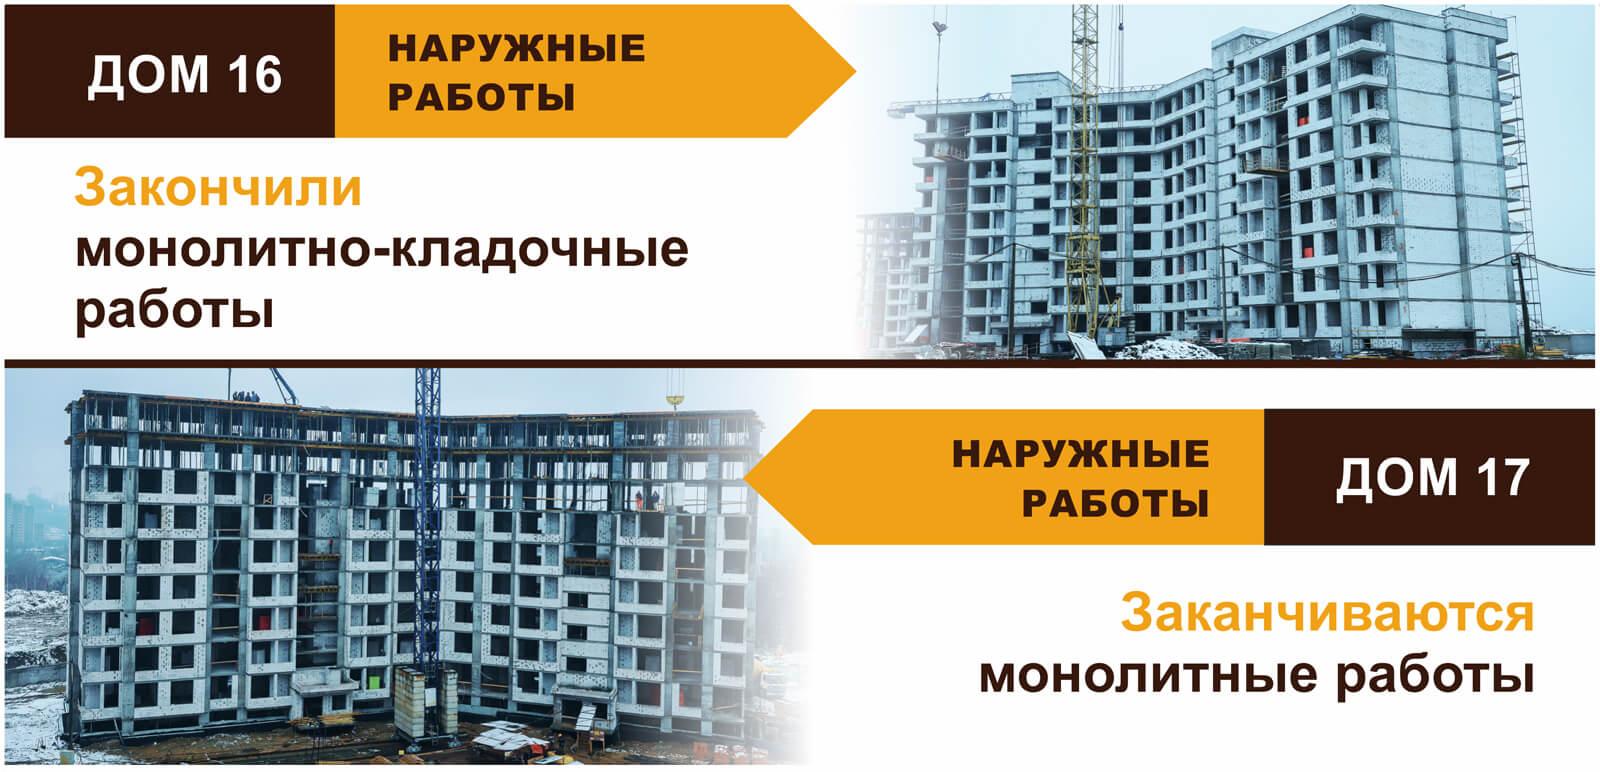 news_011217-ru